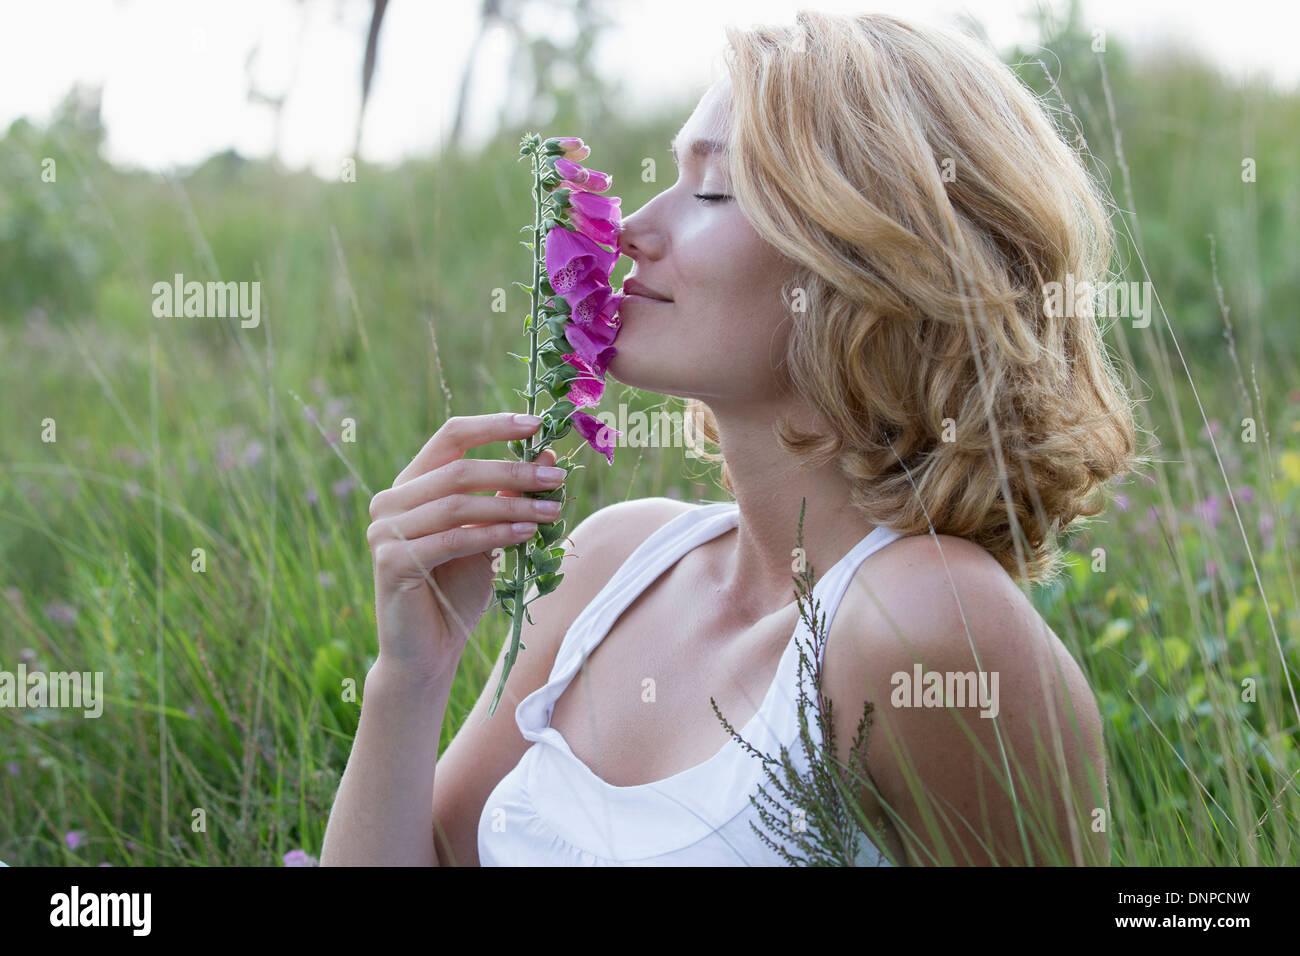 Netherlands, Gelderland, Hatertse Vennen, Portrait of happy woman with purple flower Stock Photo